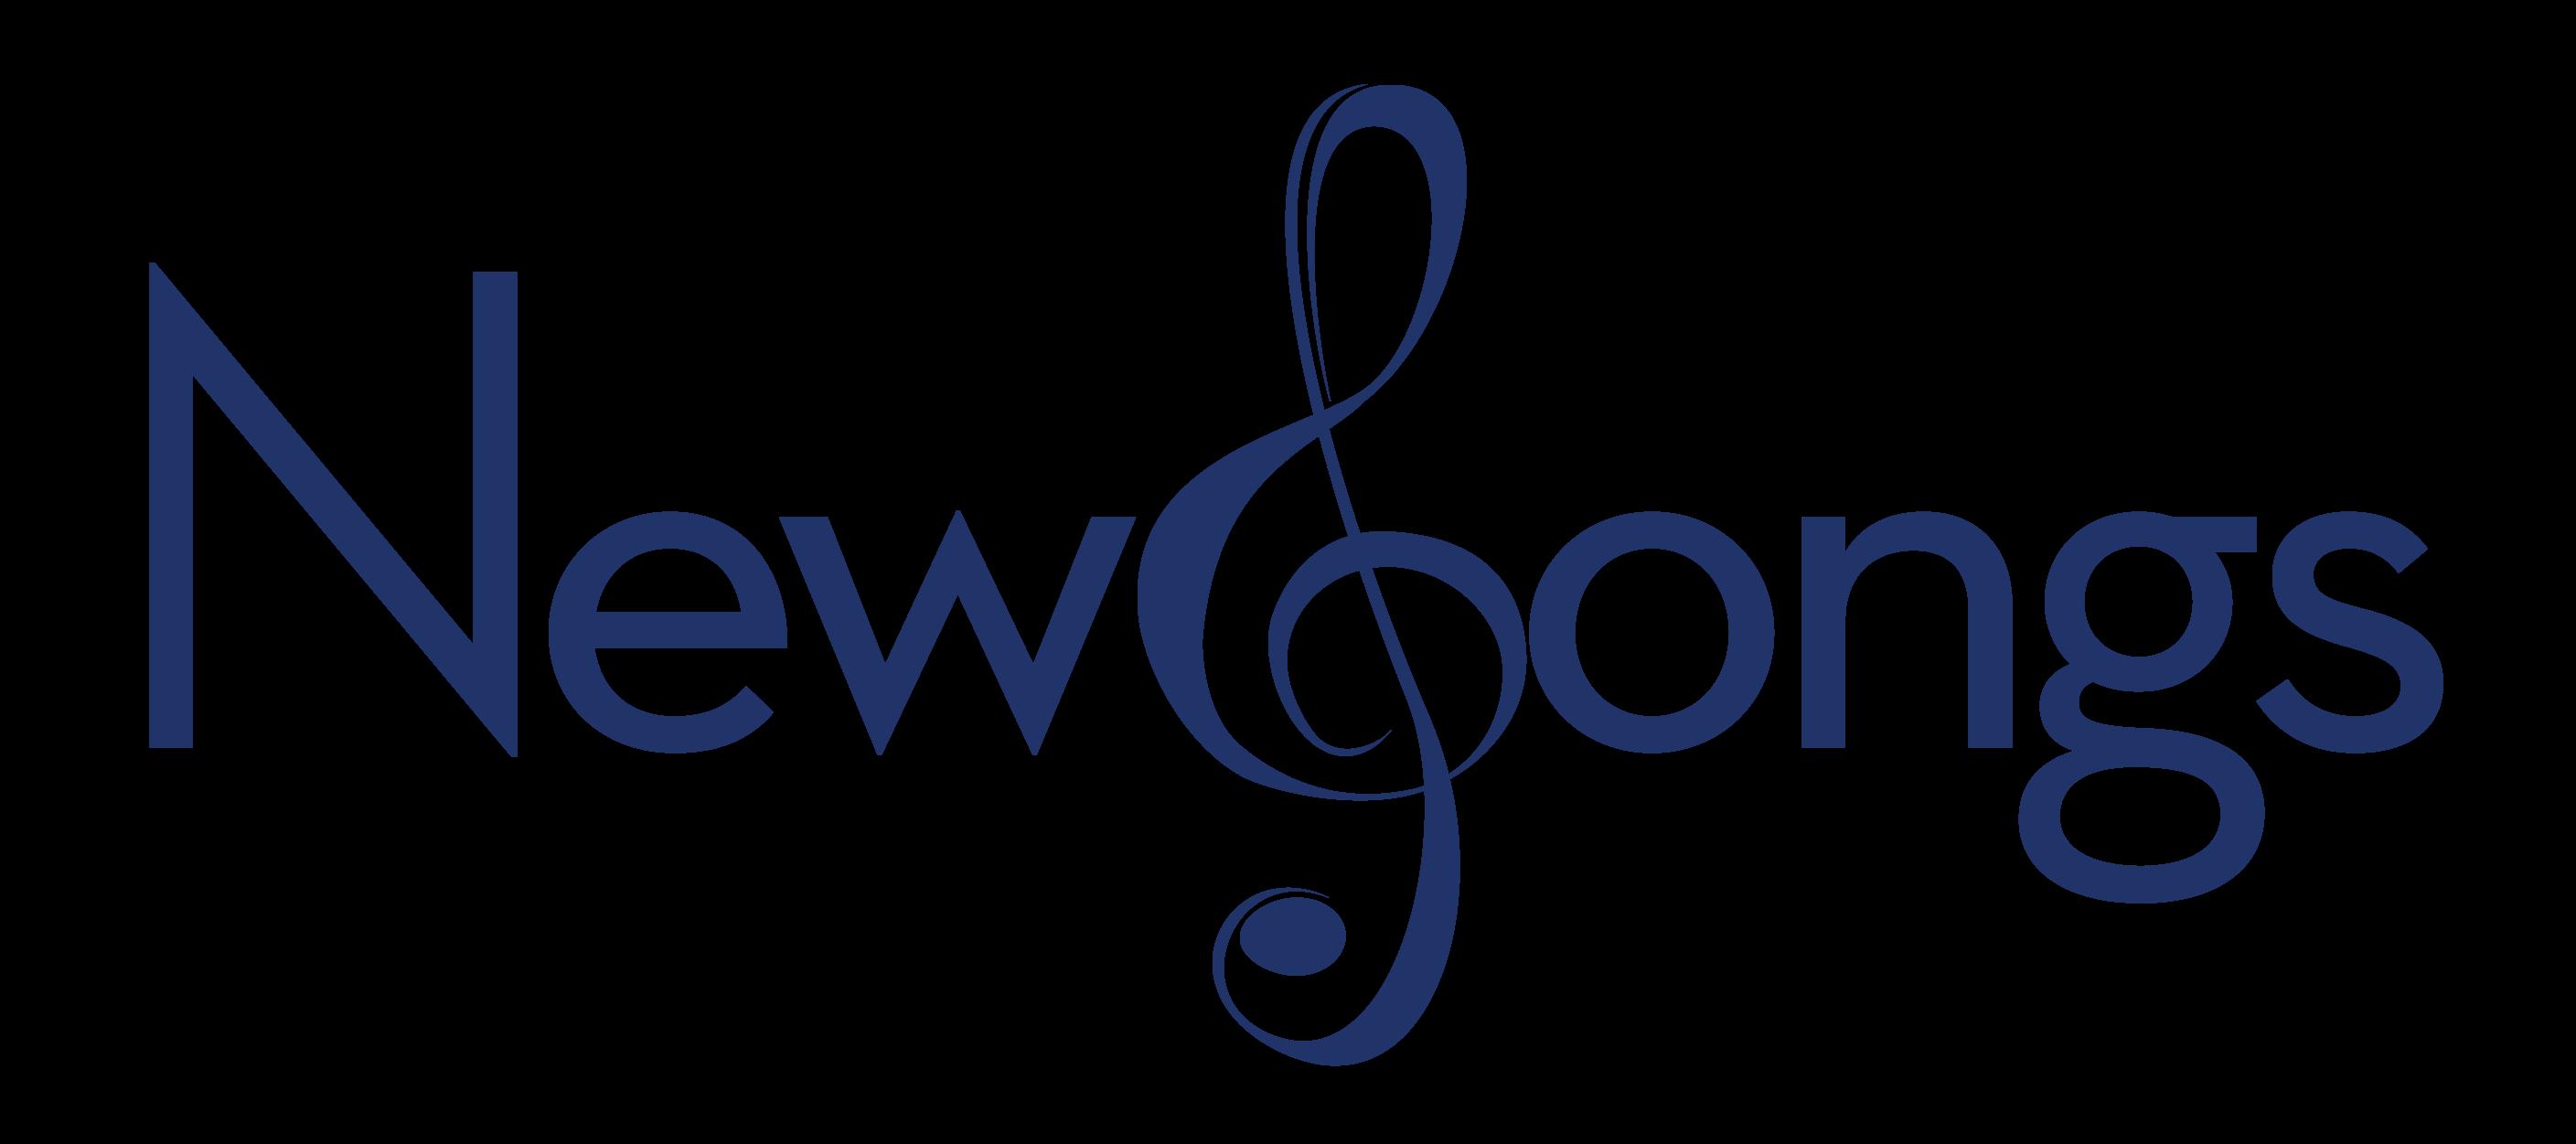 NEWSONGScanvasv2.png